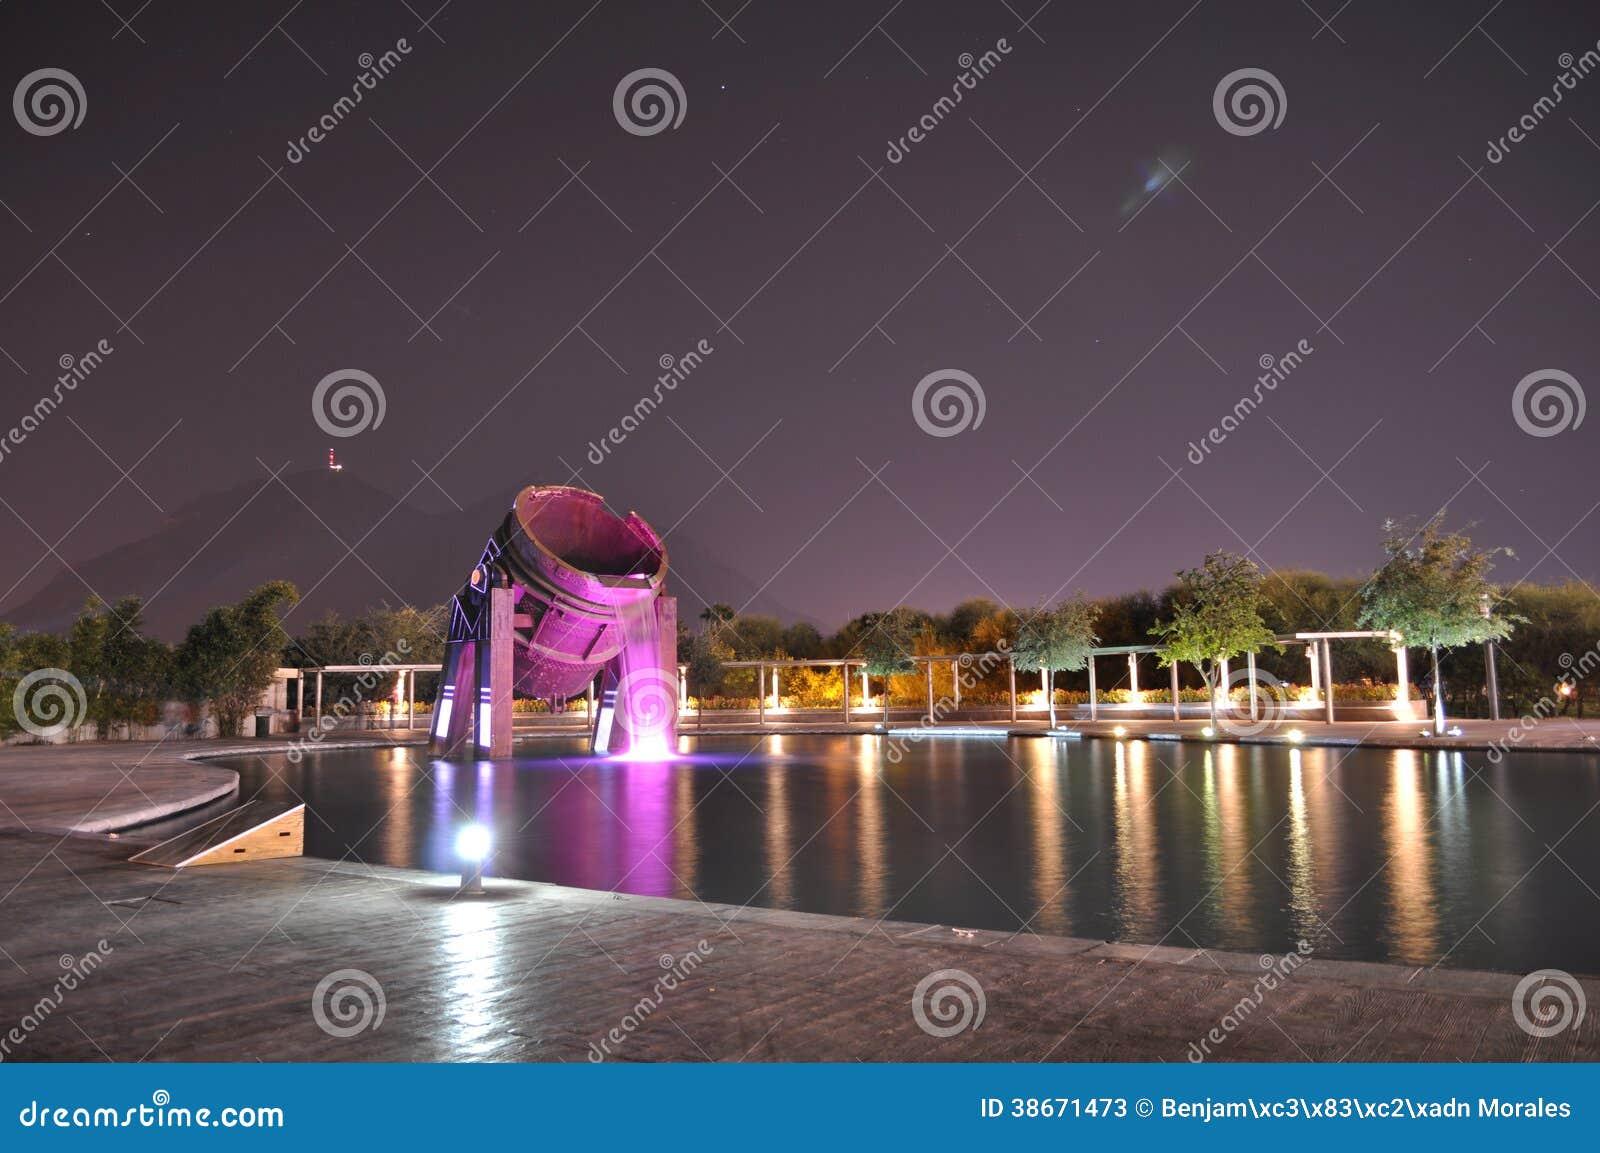 Fundidora-Parktrommel-Monumentbrunnen